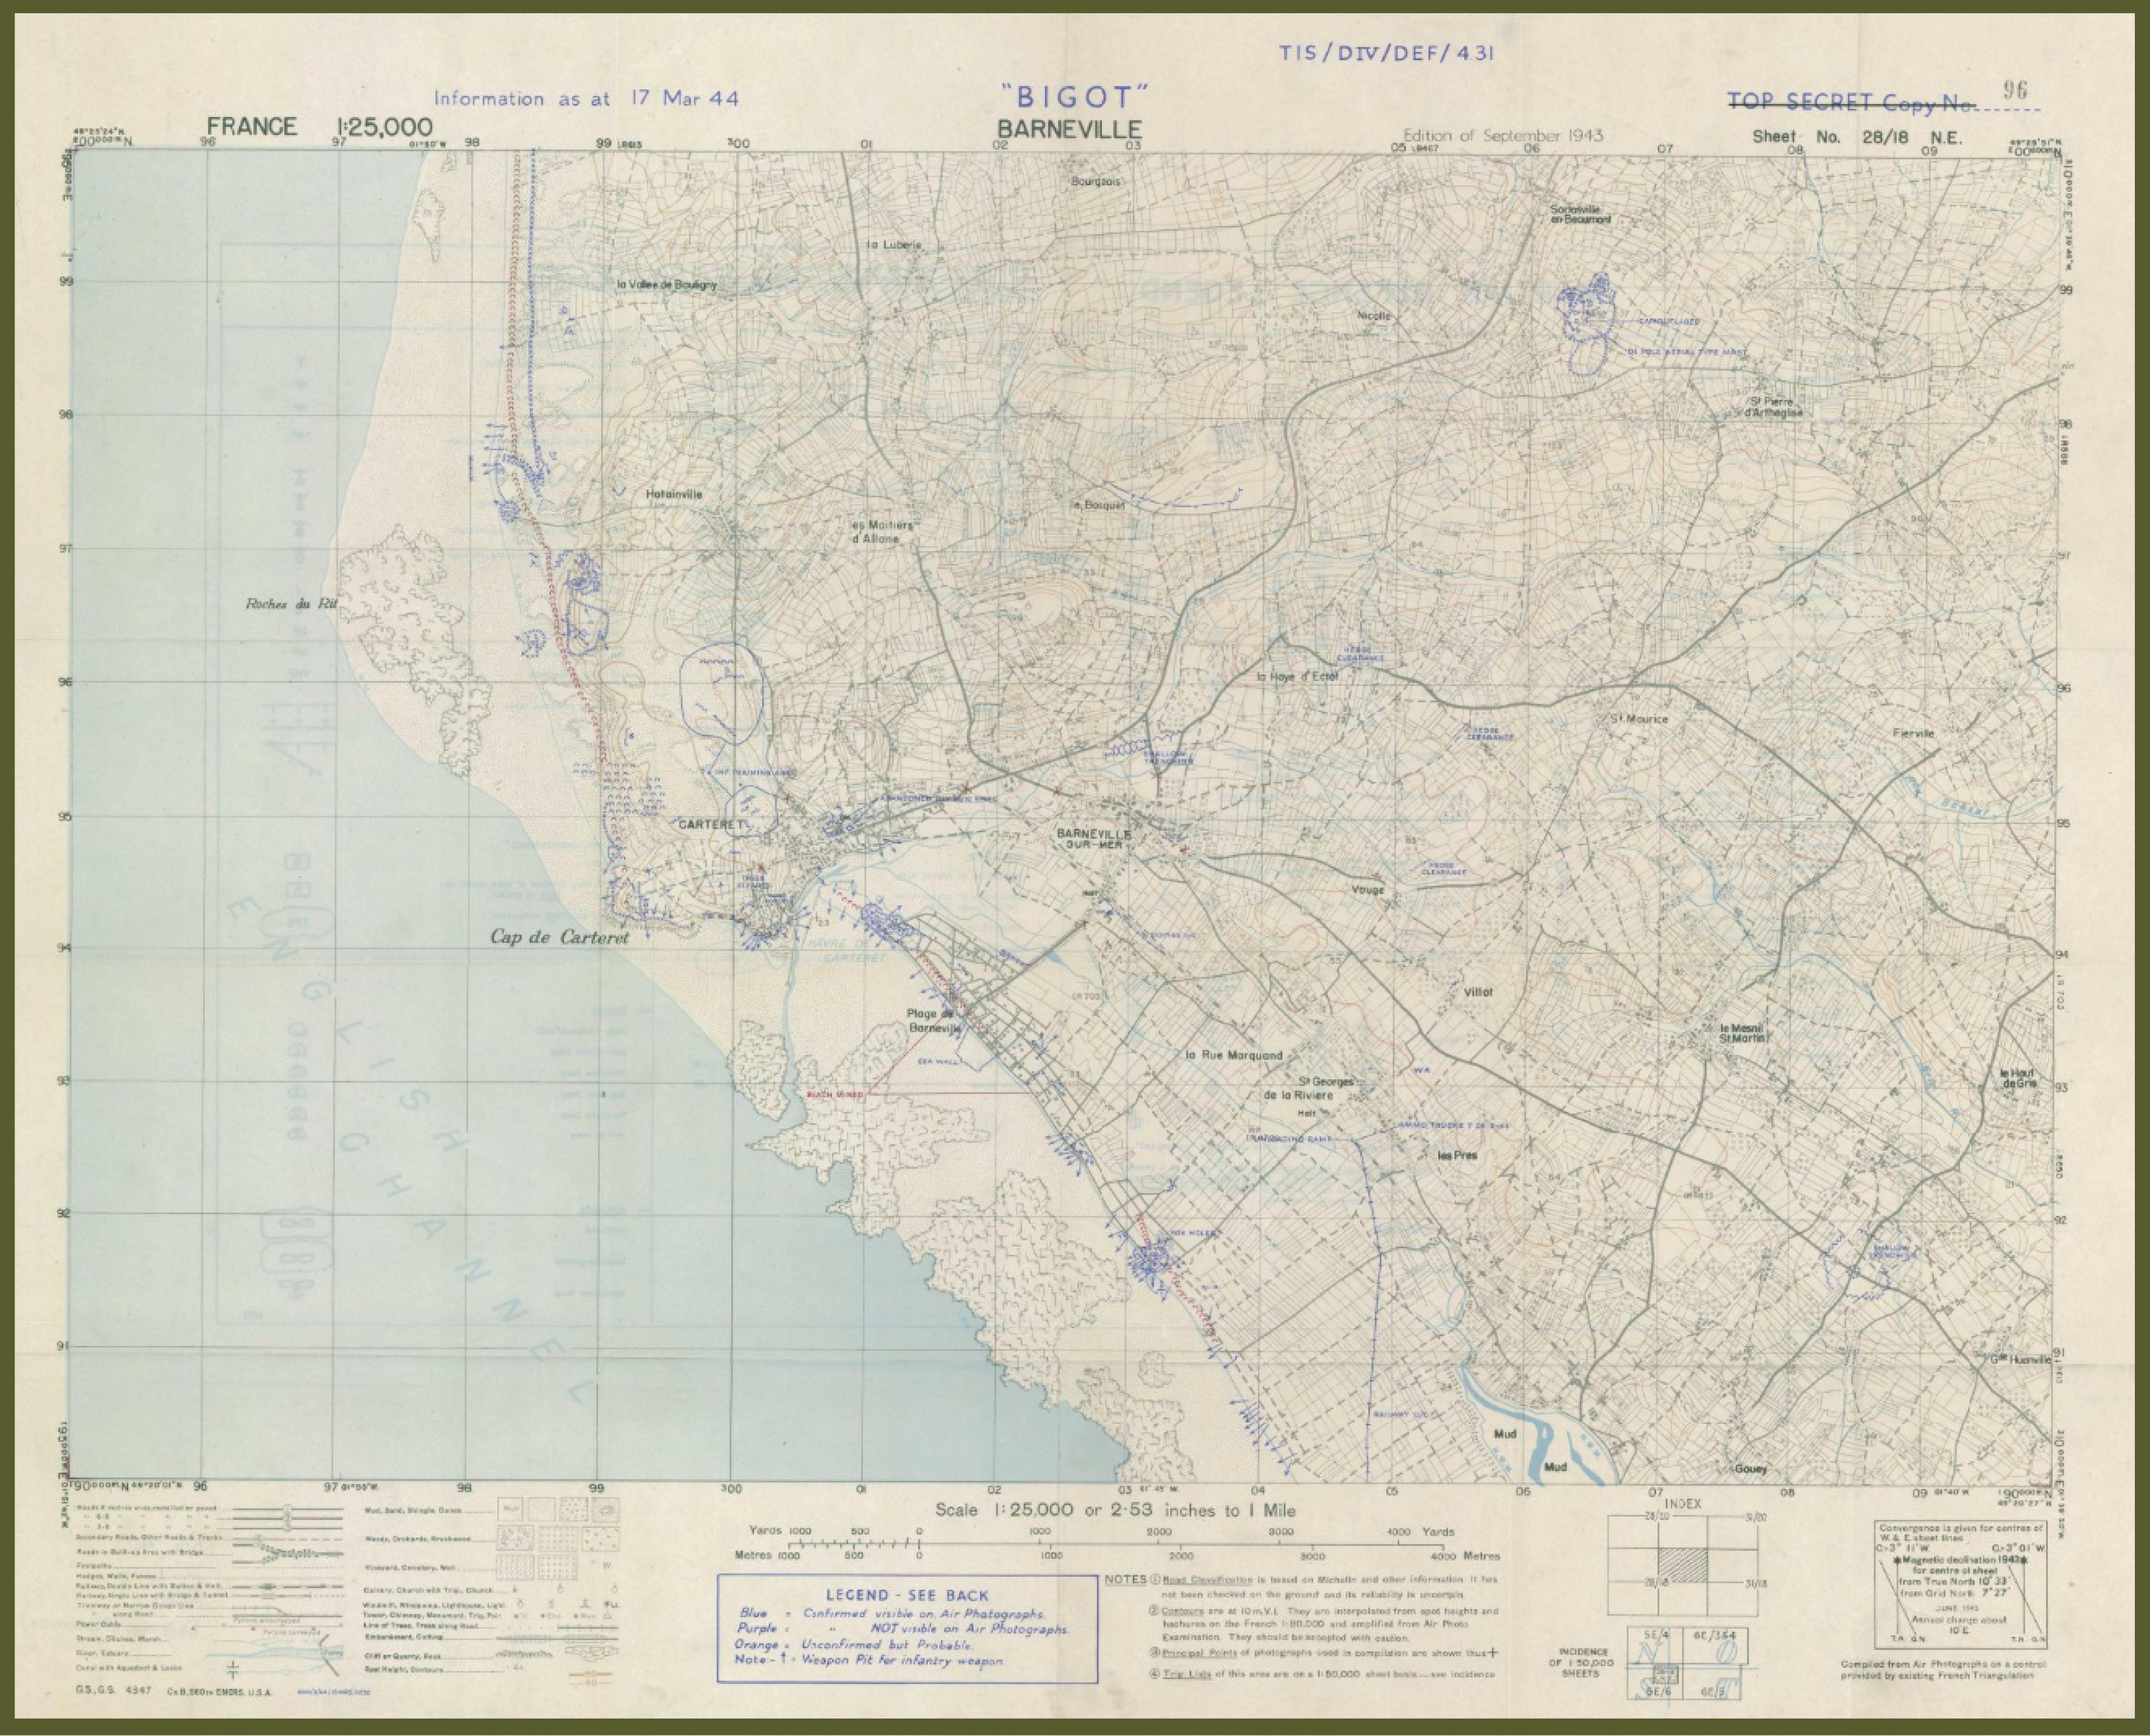 Defense map Barneville Bigot